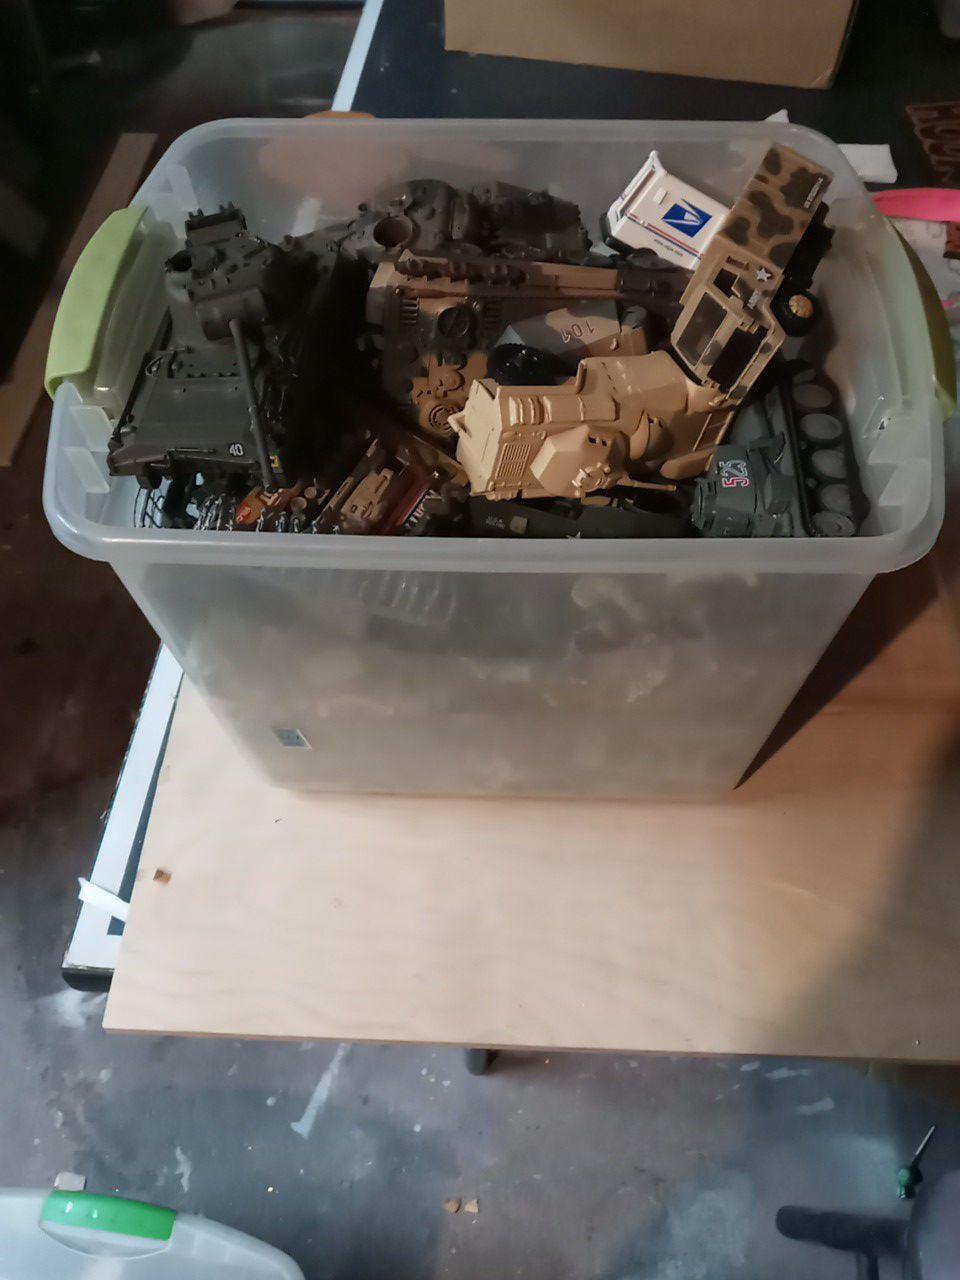 Army toy soilders